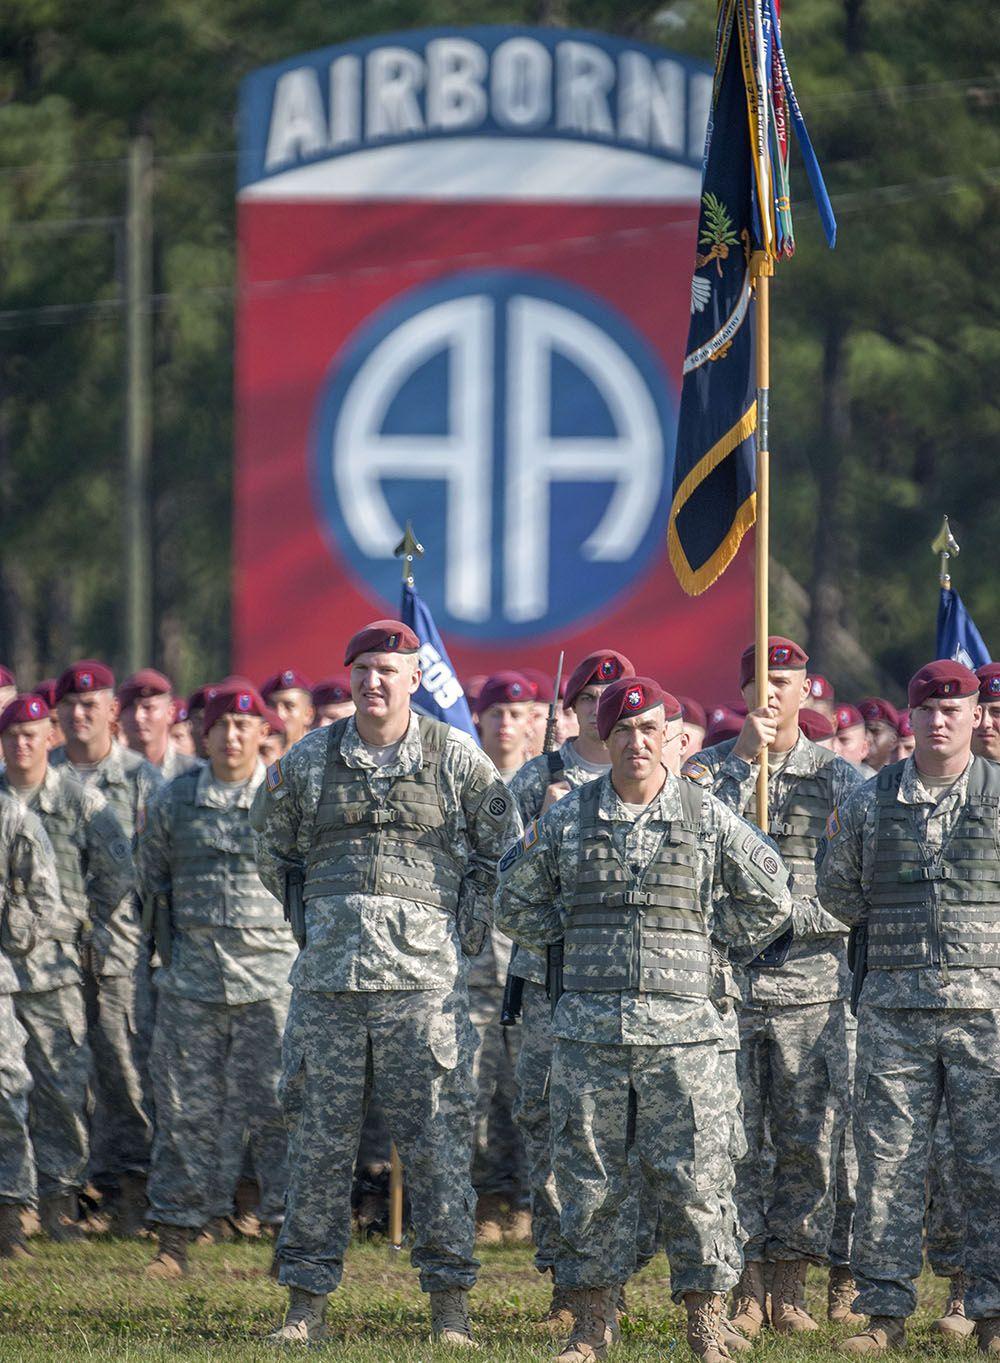 Based at Fort Bragg, North Carolina, the 82nd Airborne